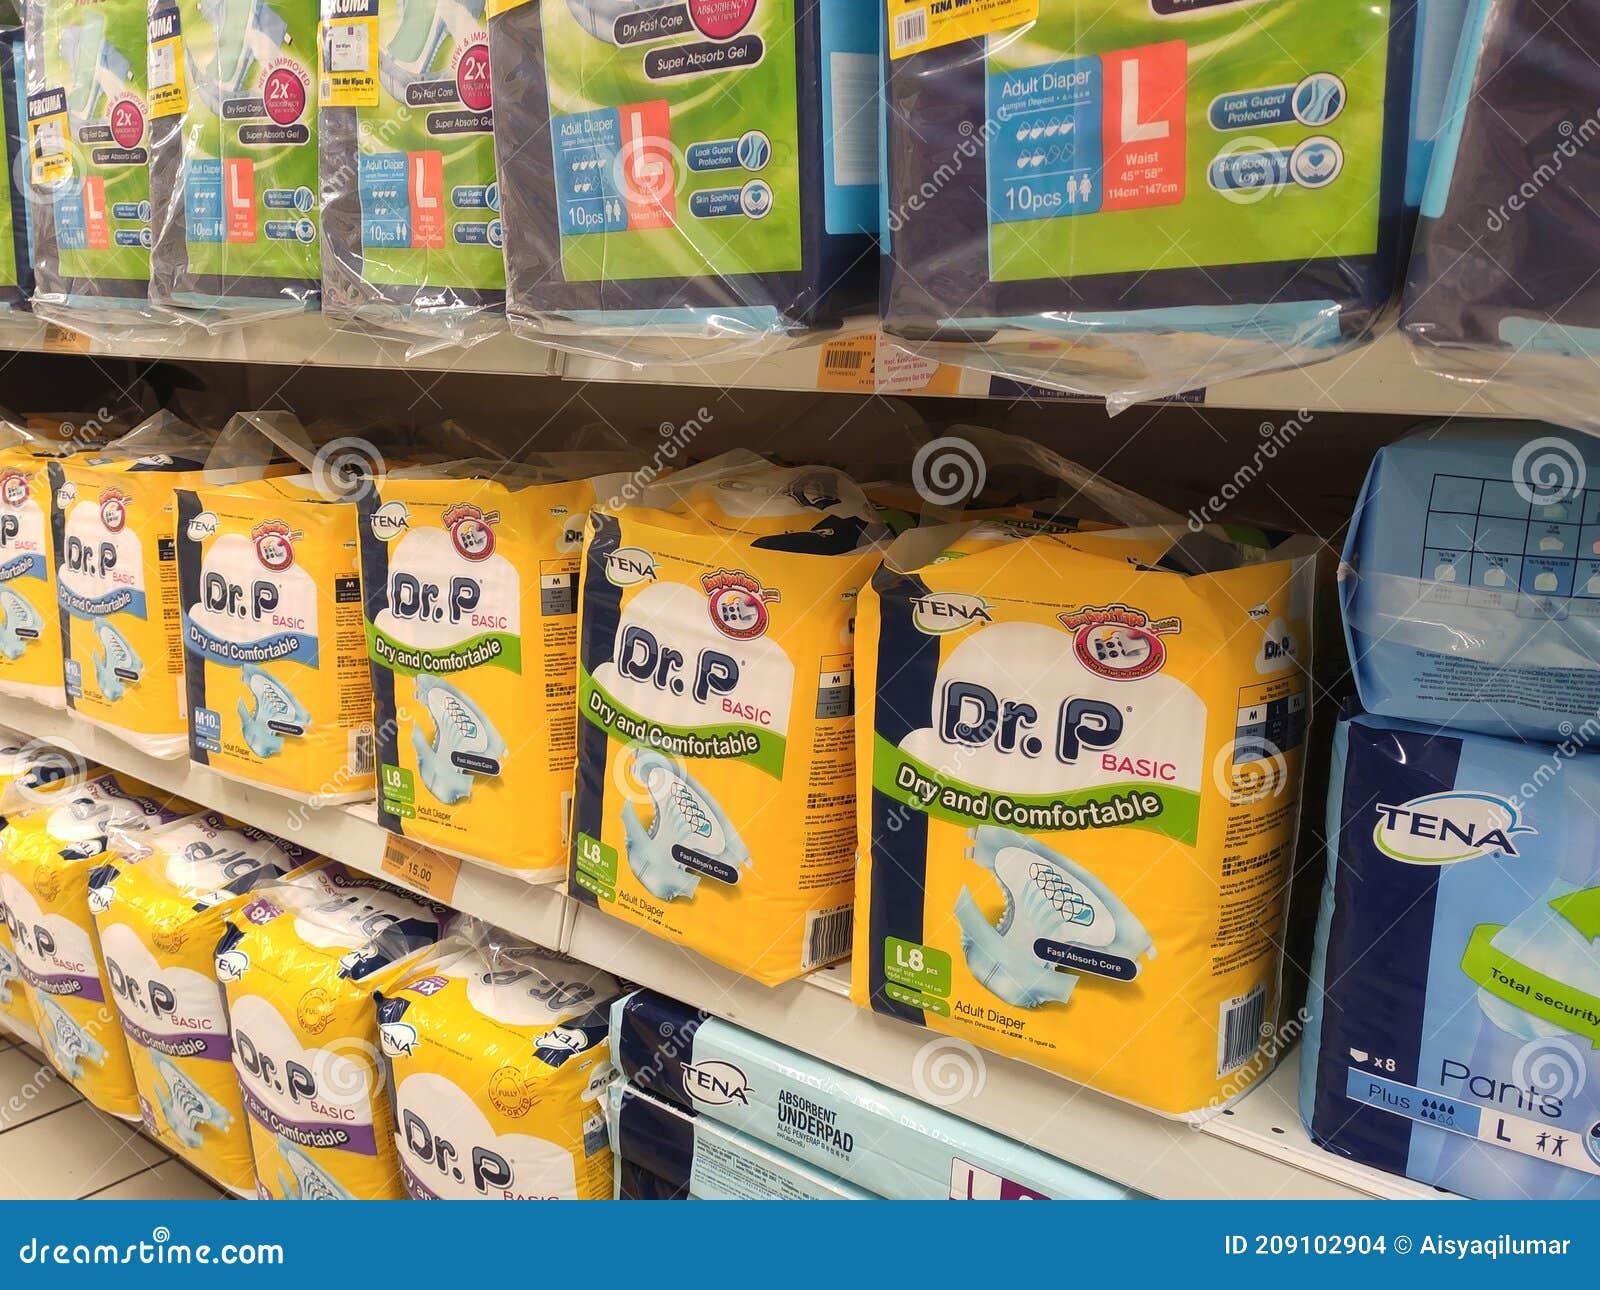 Adult Diaper Gallery